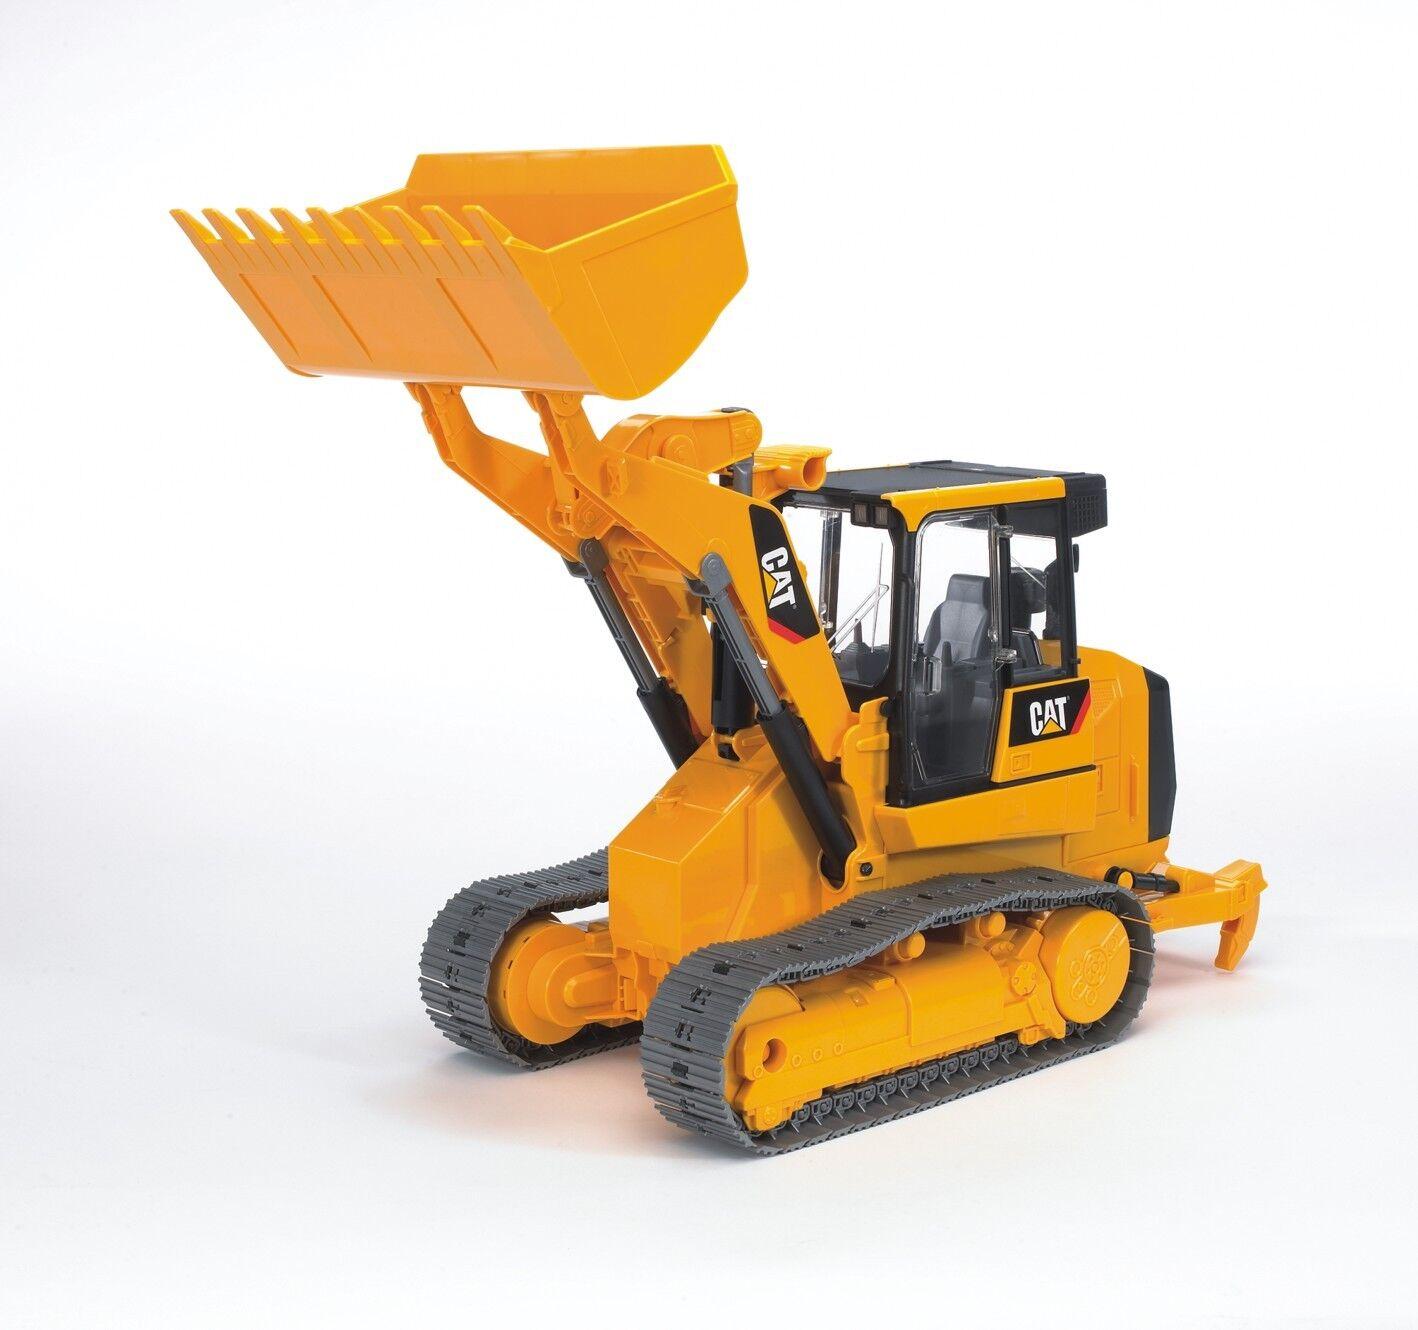 Bruder 02447 Kettenlader Kettenlader Kettenlader Raupe Bulldozer CAT für die Baustelle Bworld e9730d